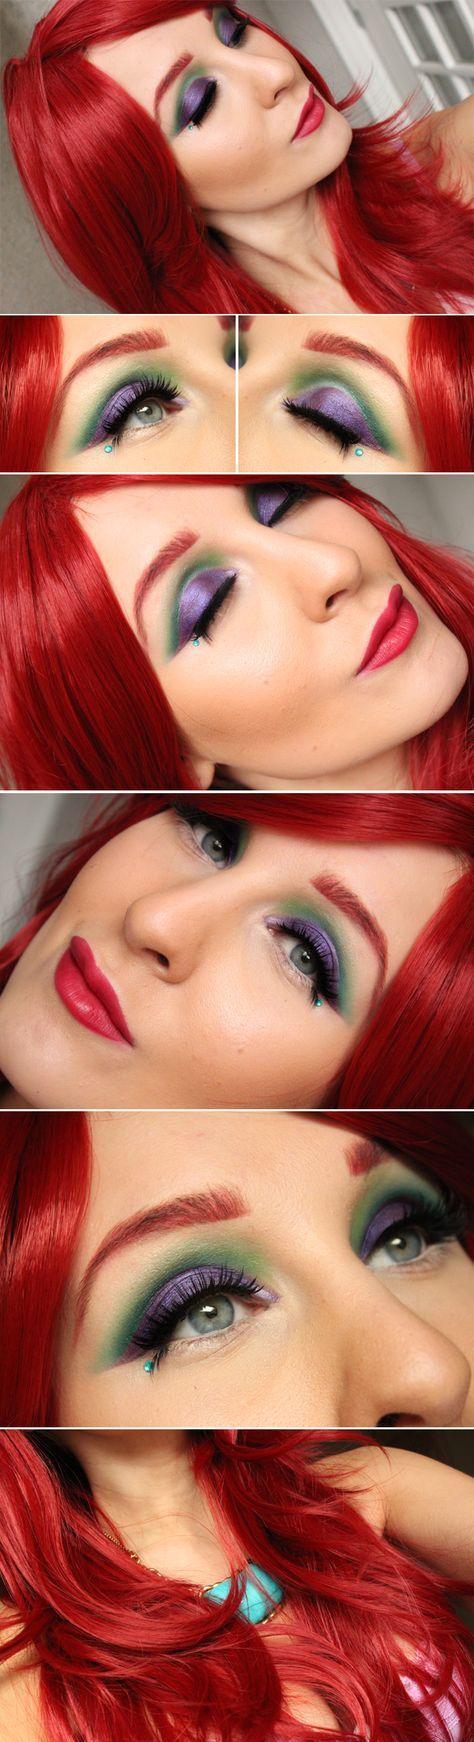 Dagens makeup - Little Mermaid